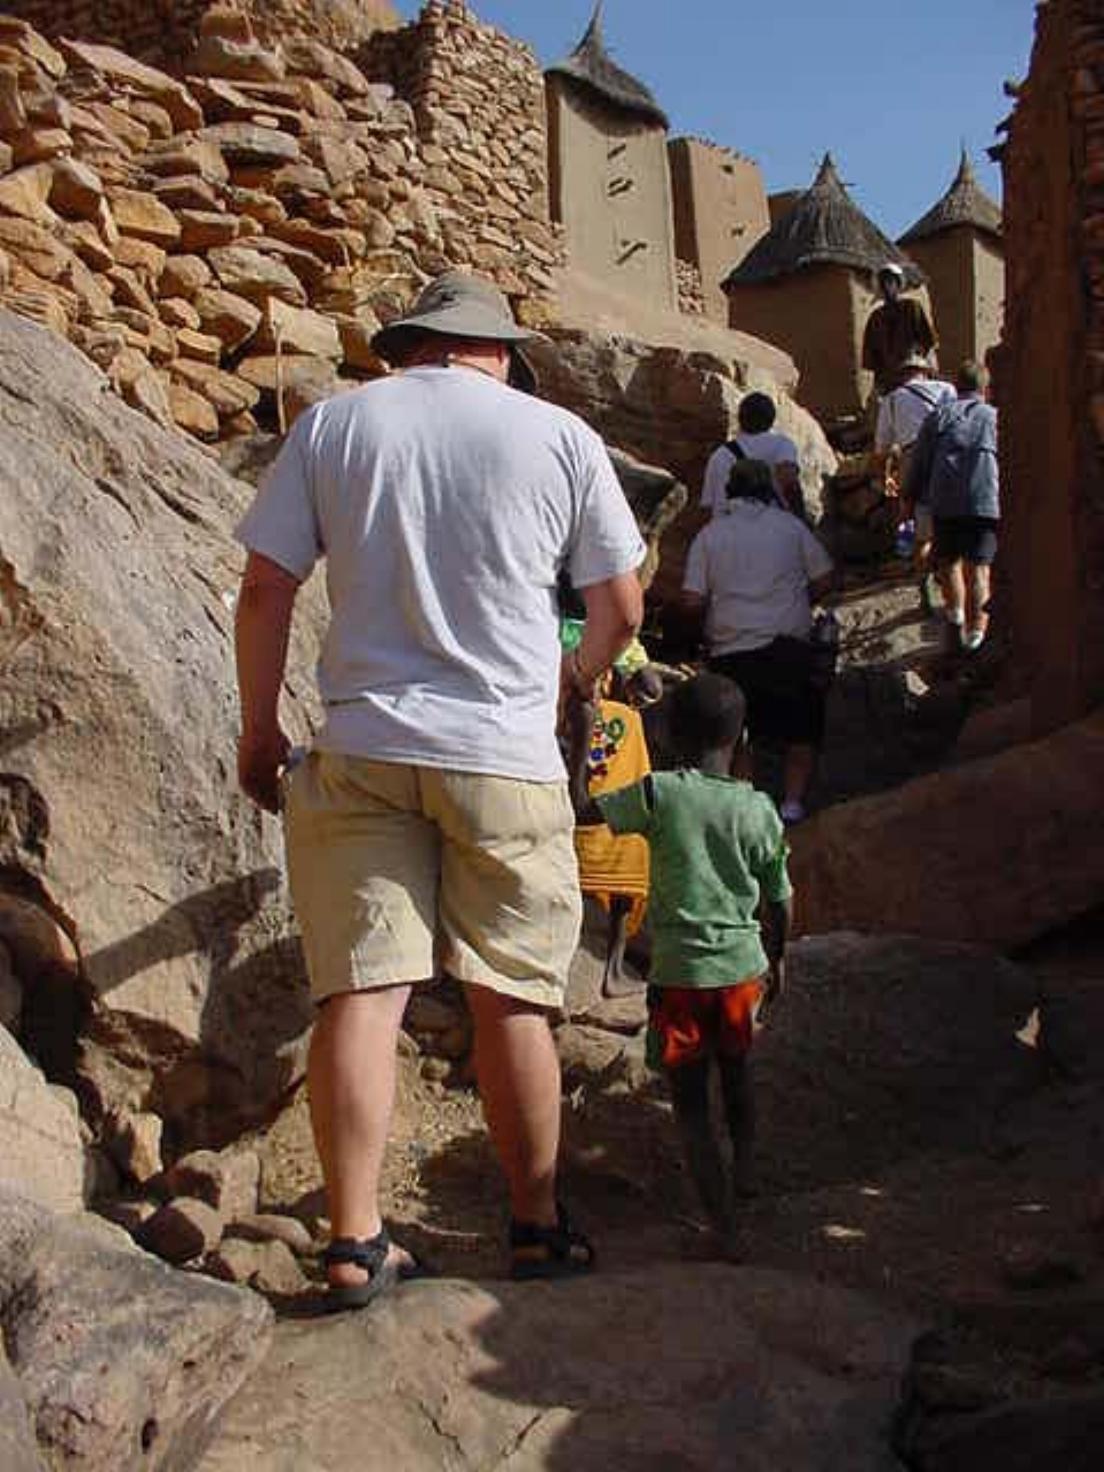 Paul Shumway follows some local children